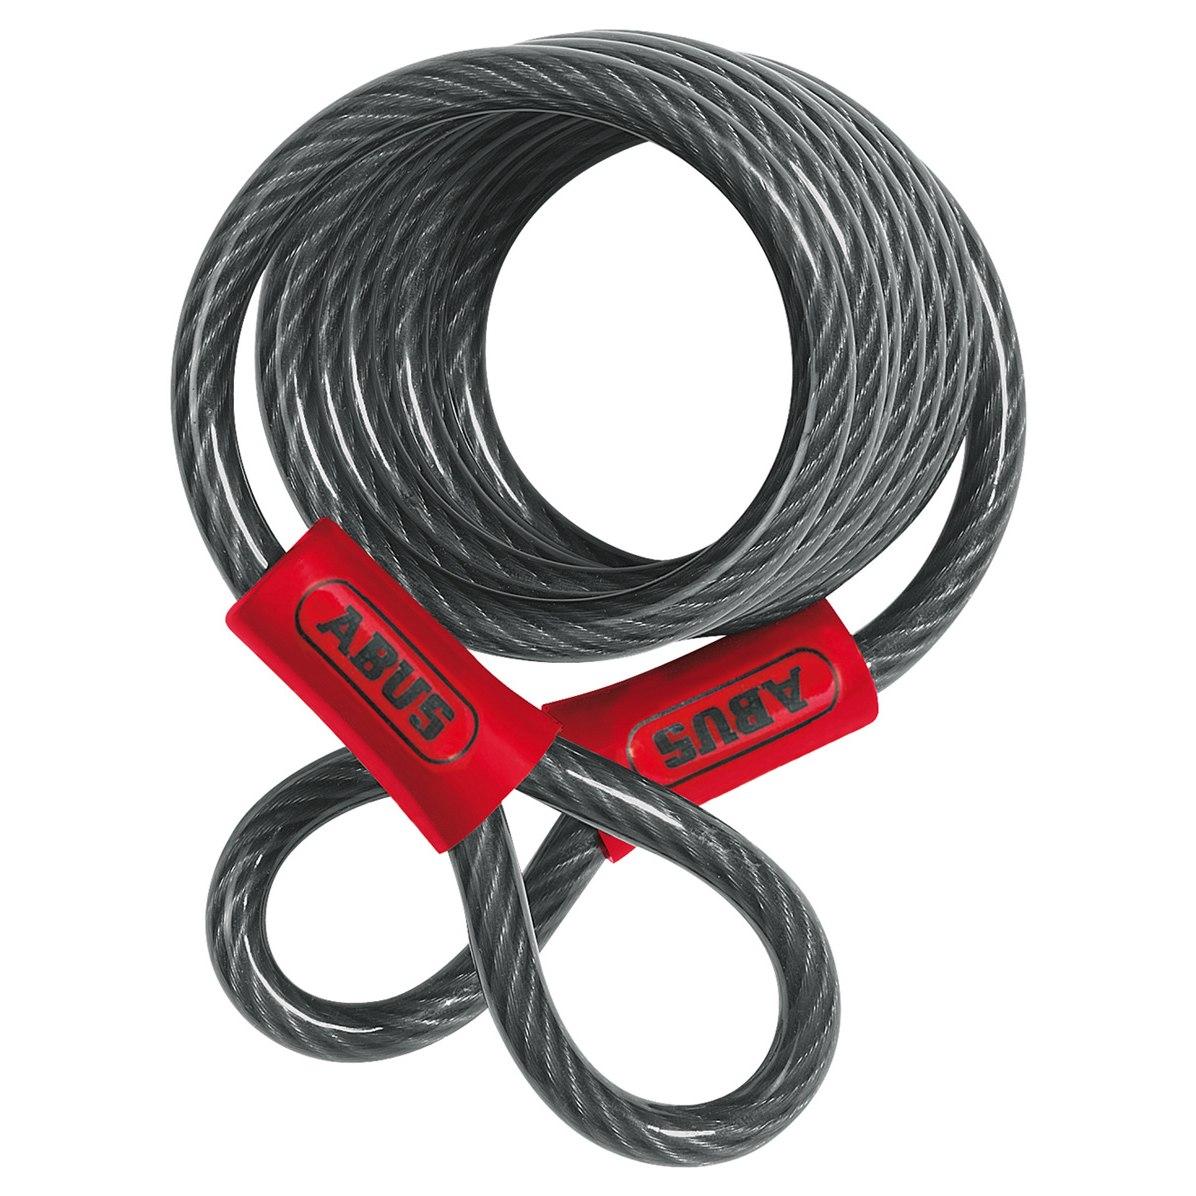 ABUS Cobra Loop Cable - 8 mm x 185 cm